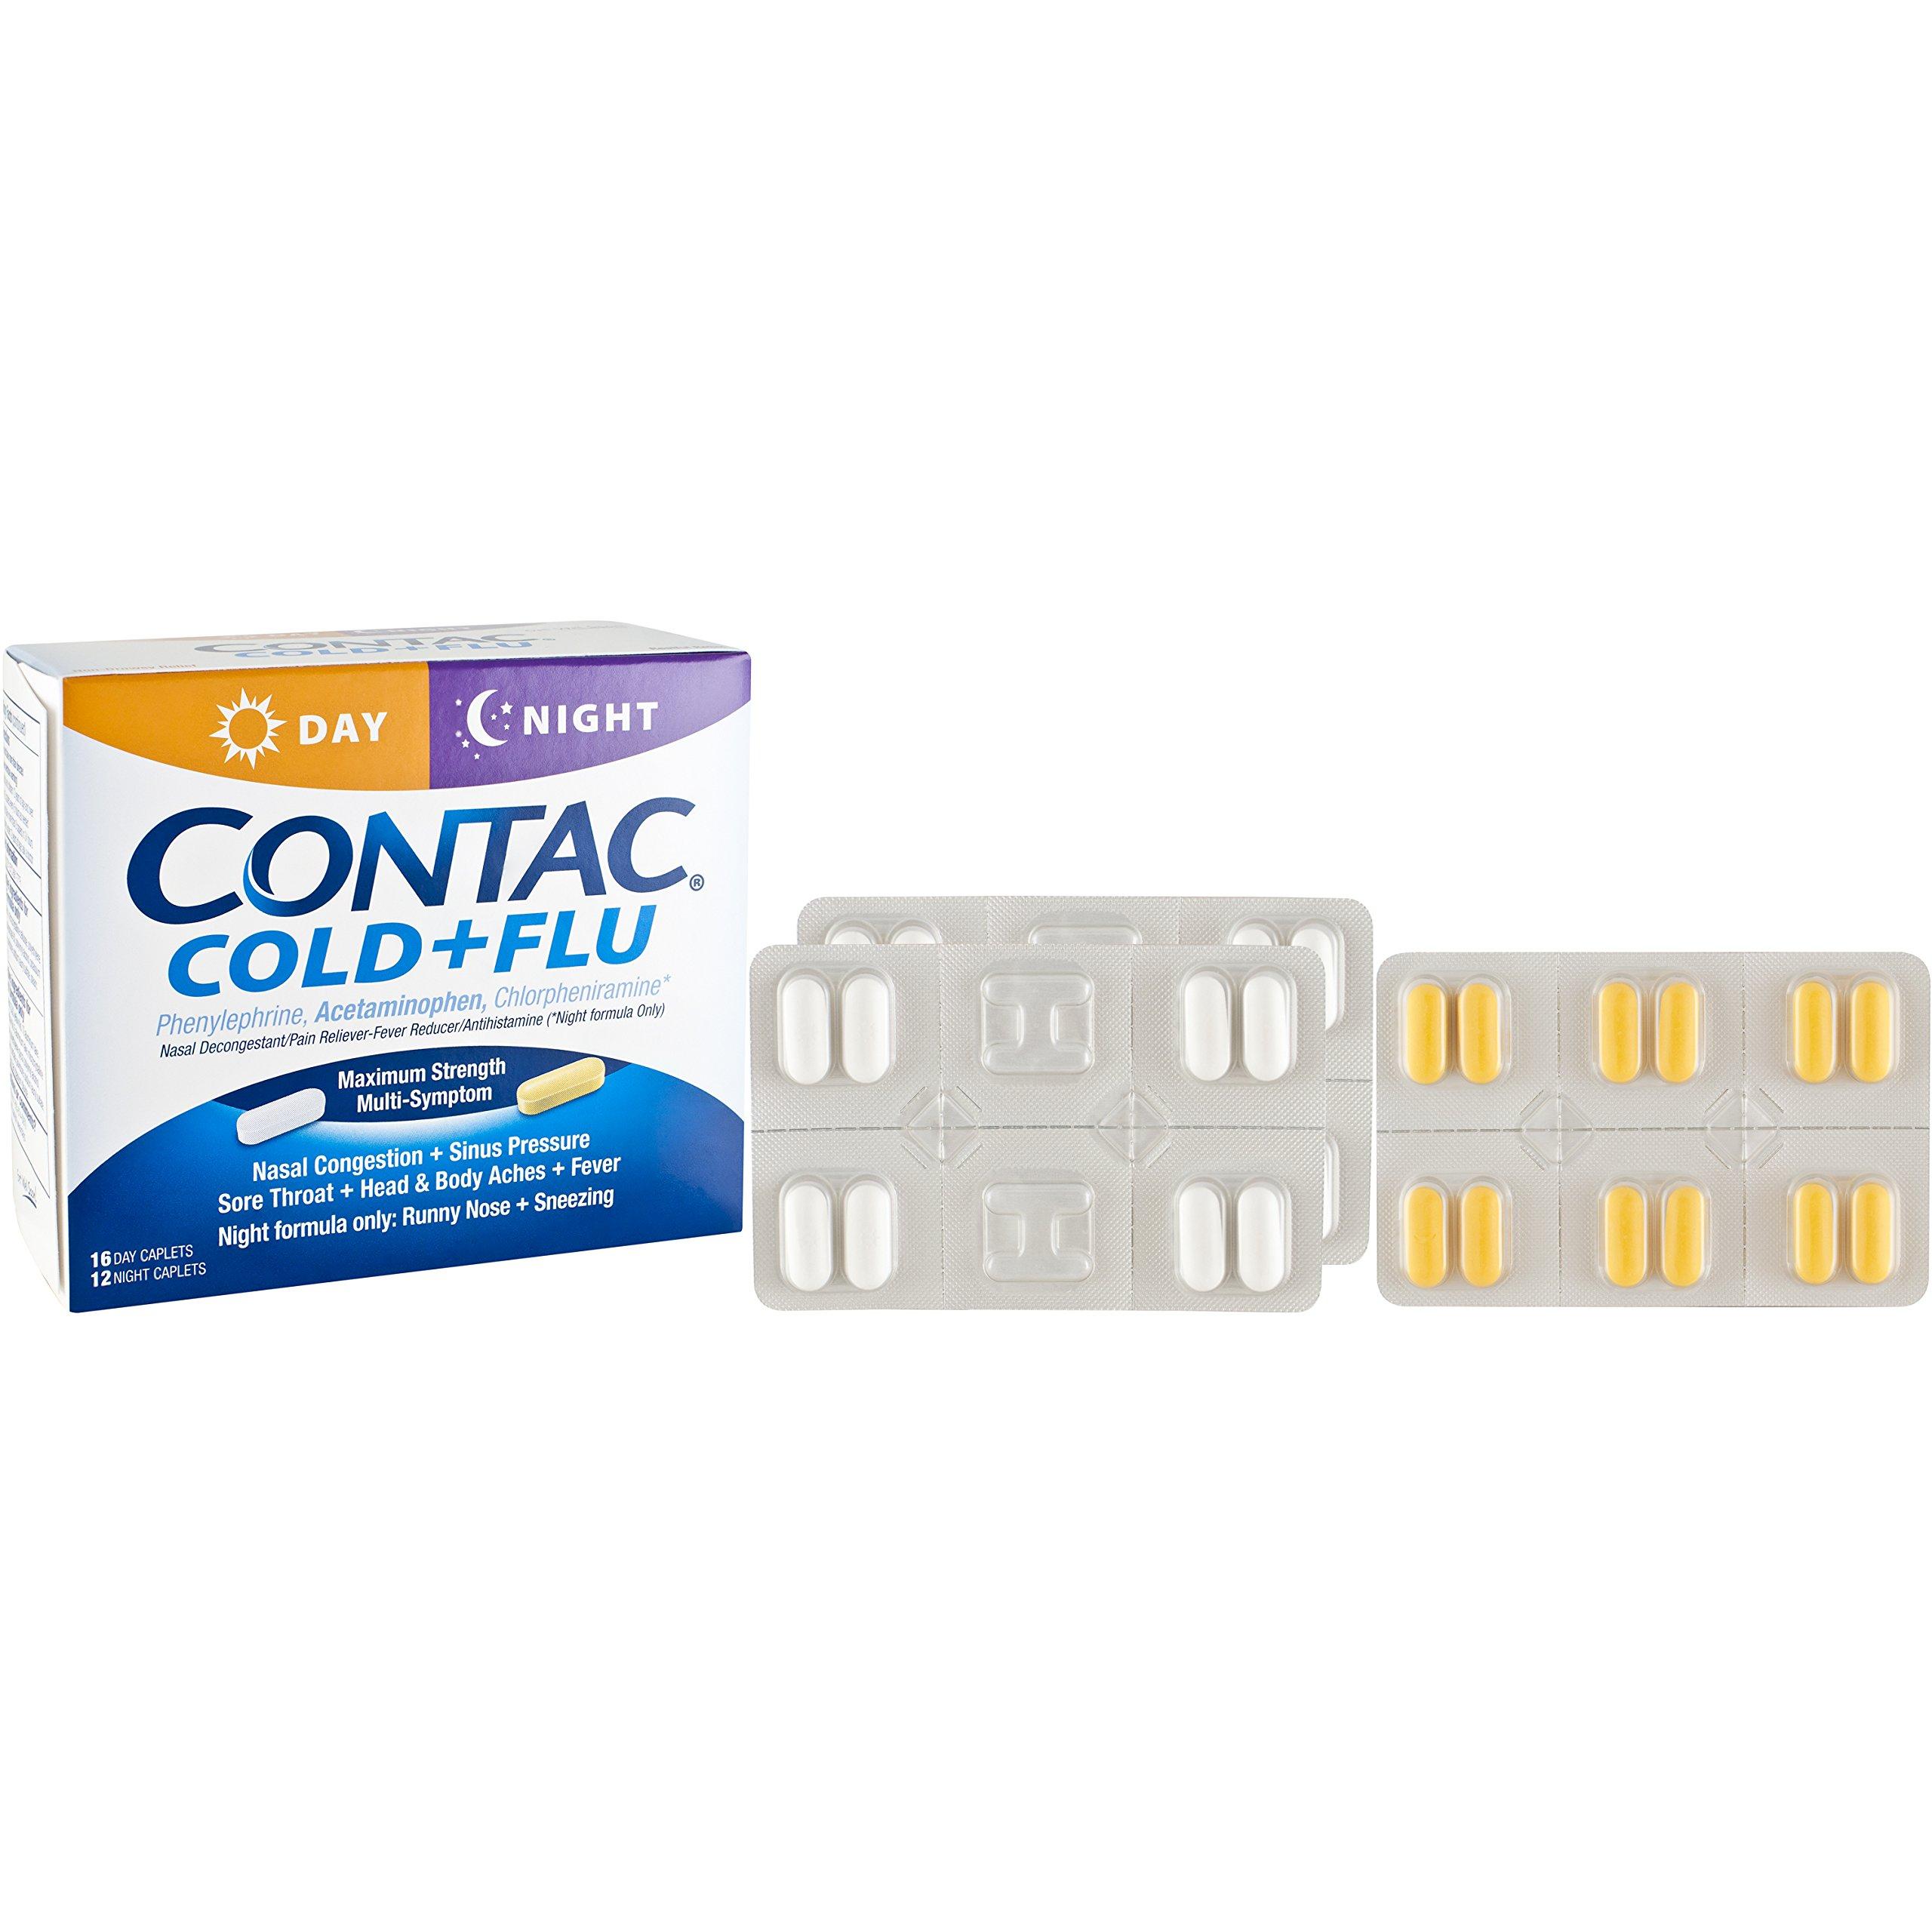 Watch Contac ColdFlu Maximum Strength Reviews video